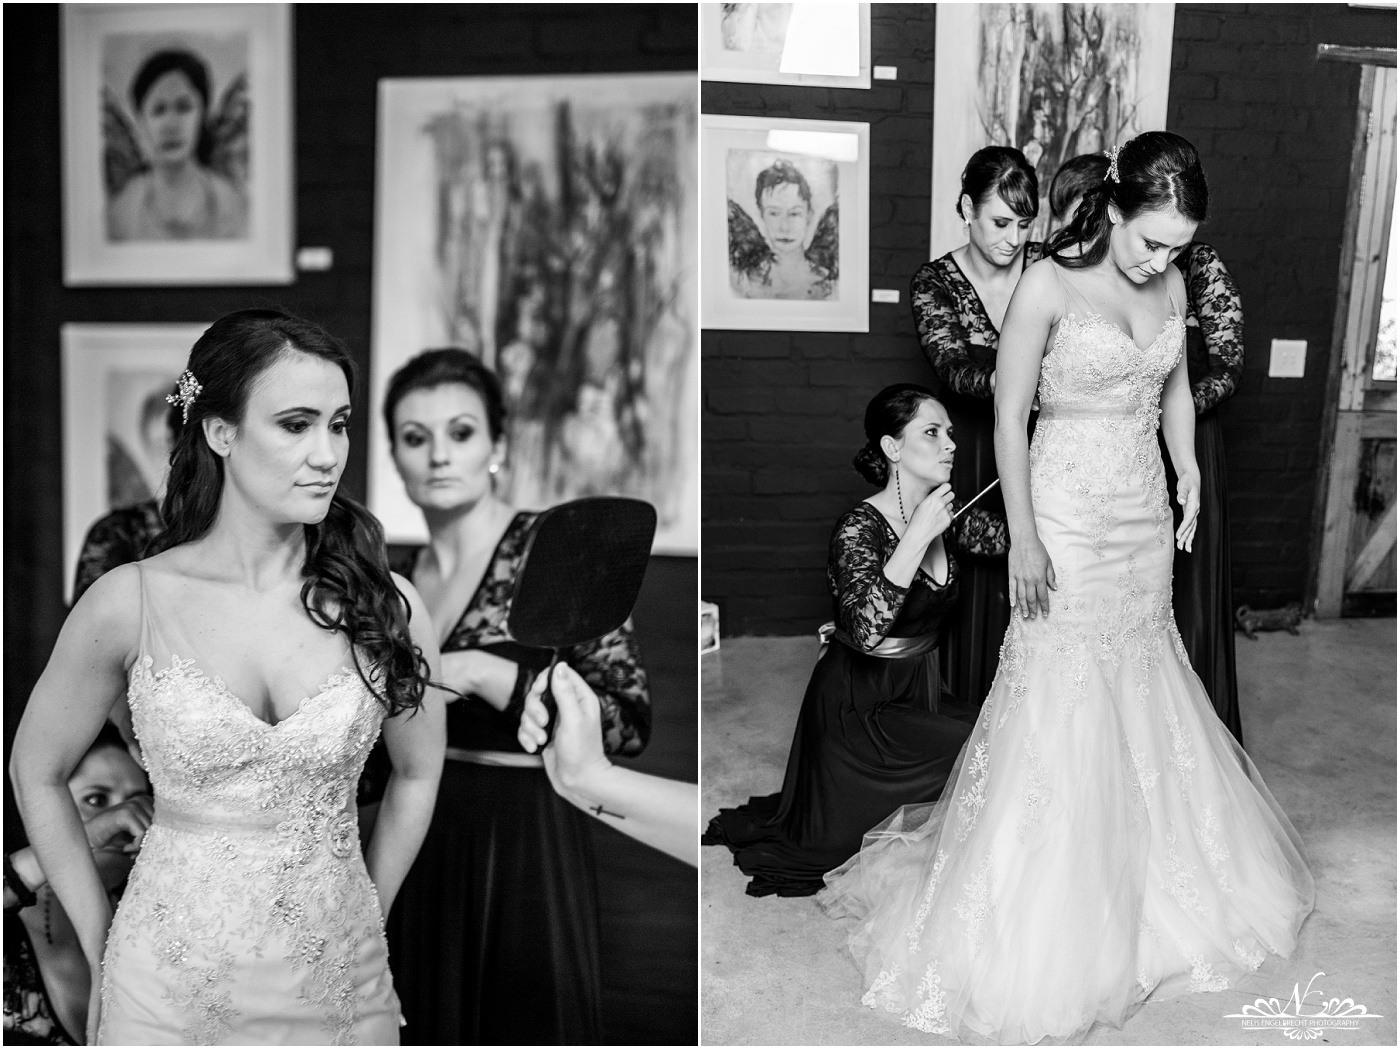 Eensgezind-Wedding-Photos-Nelis-Engelbrecht-Photography-031